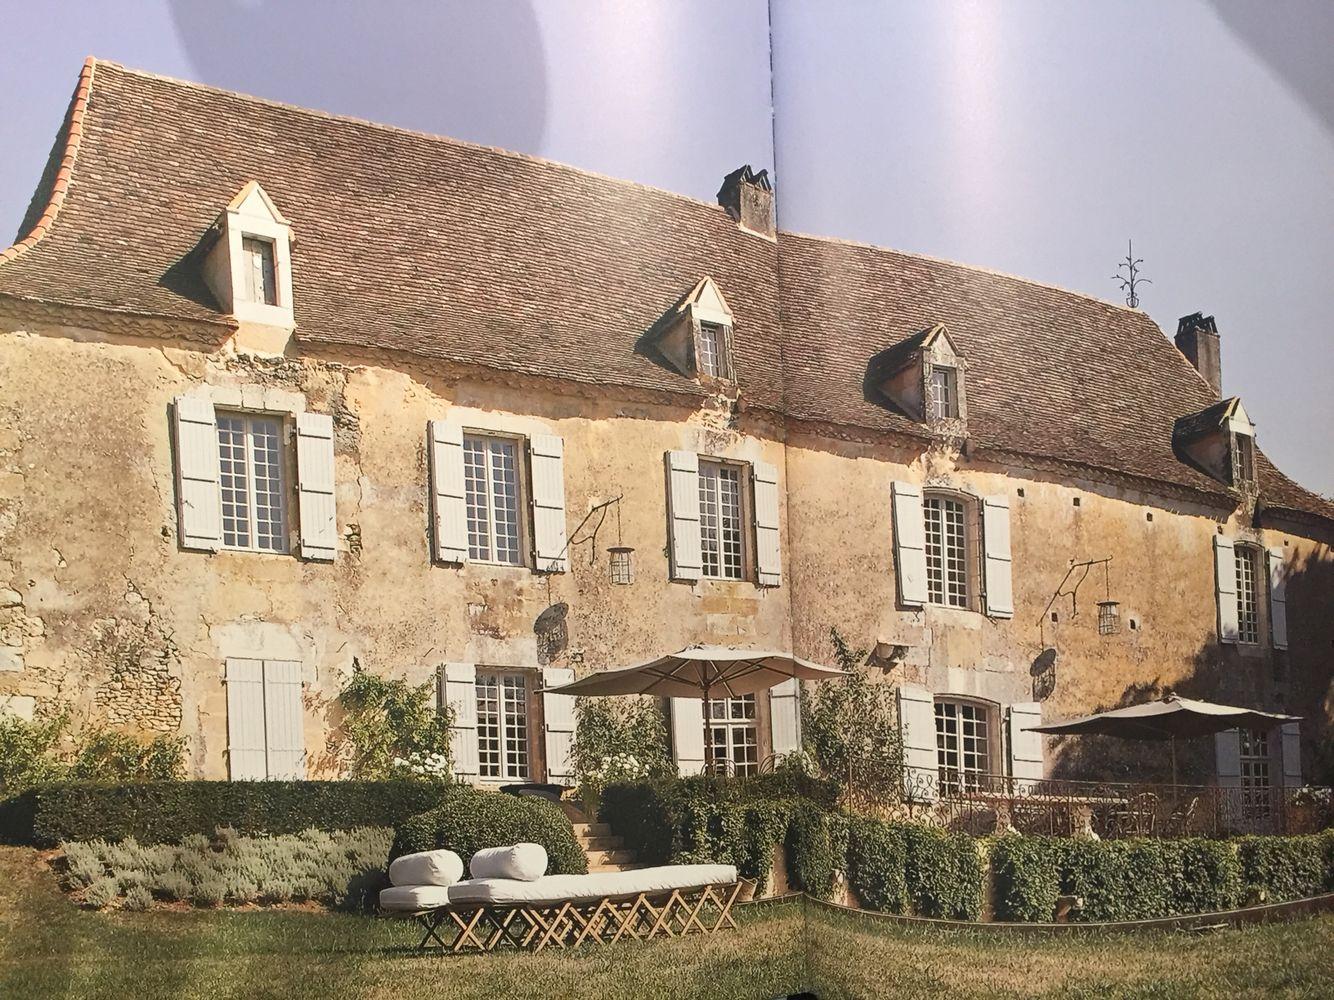 Lovely terrace | French garden project | Pinterest | Garden projects